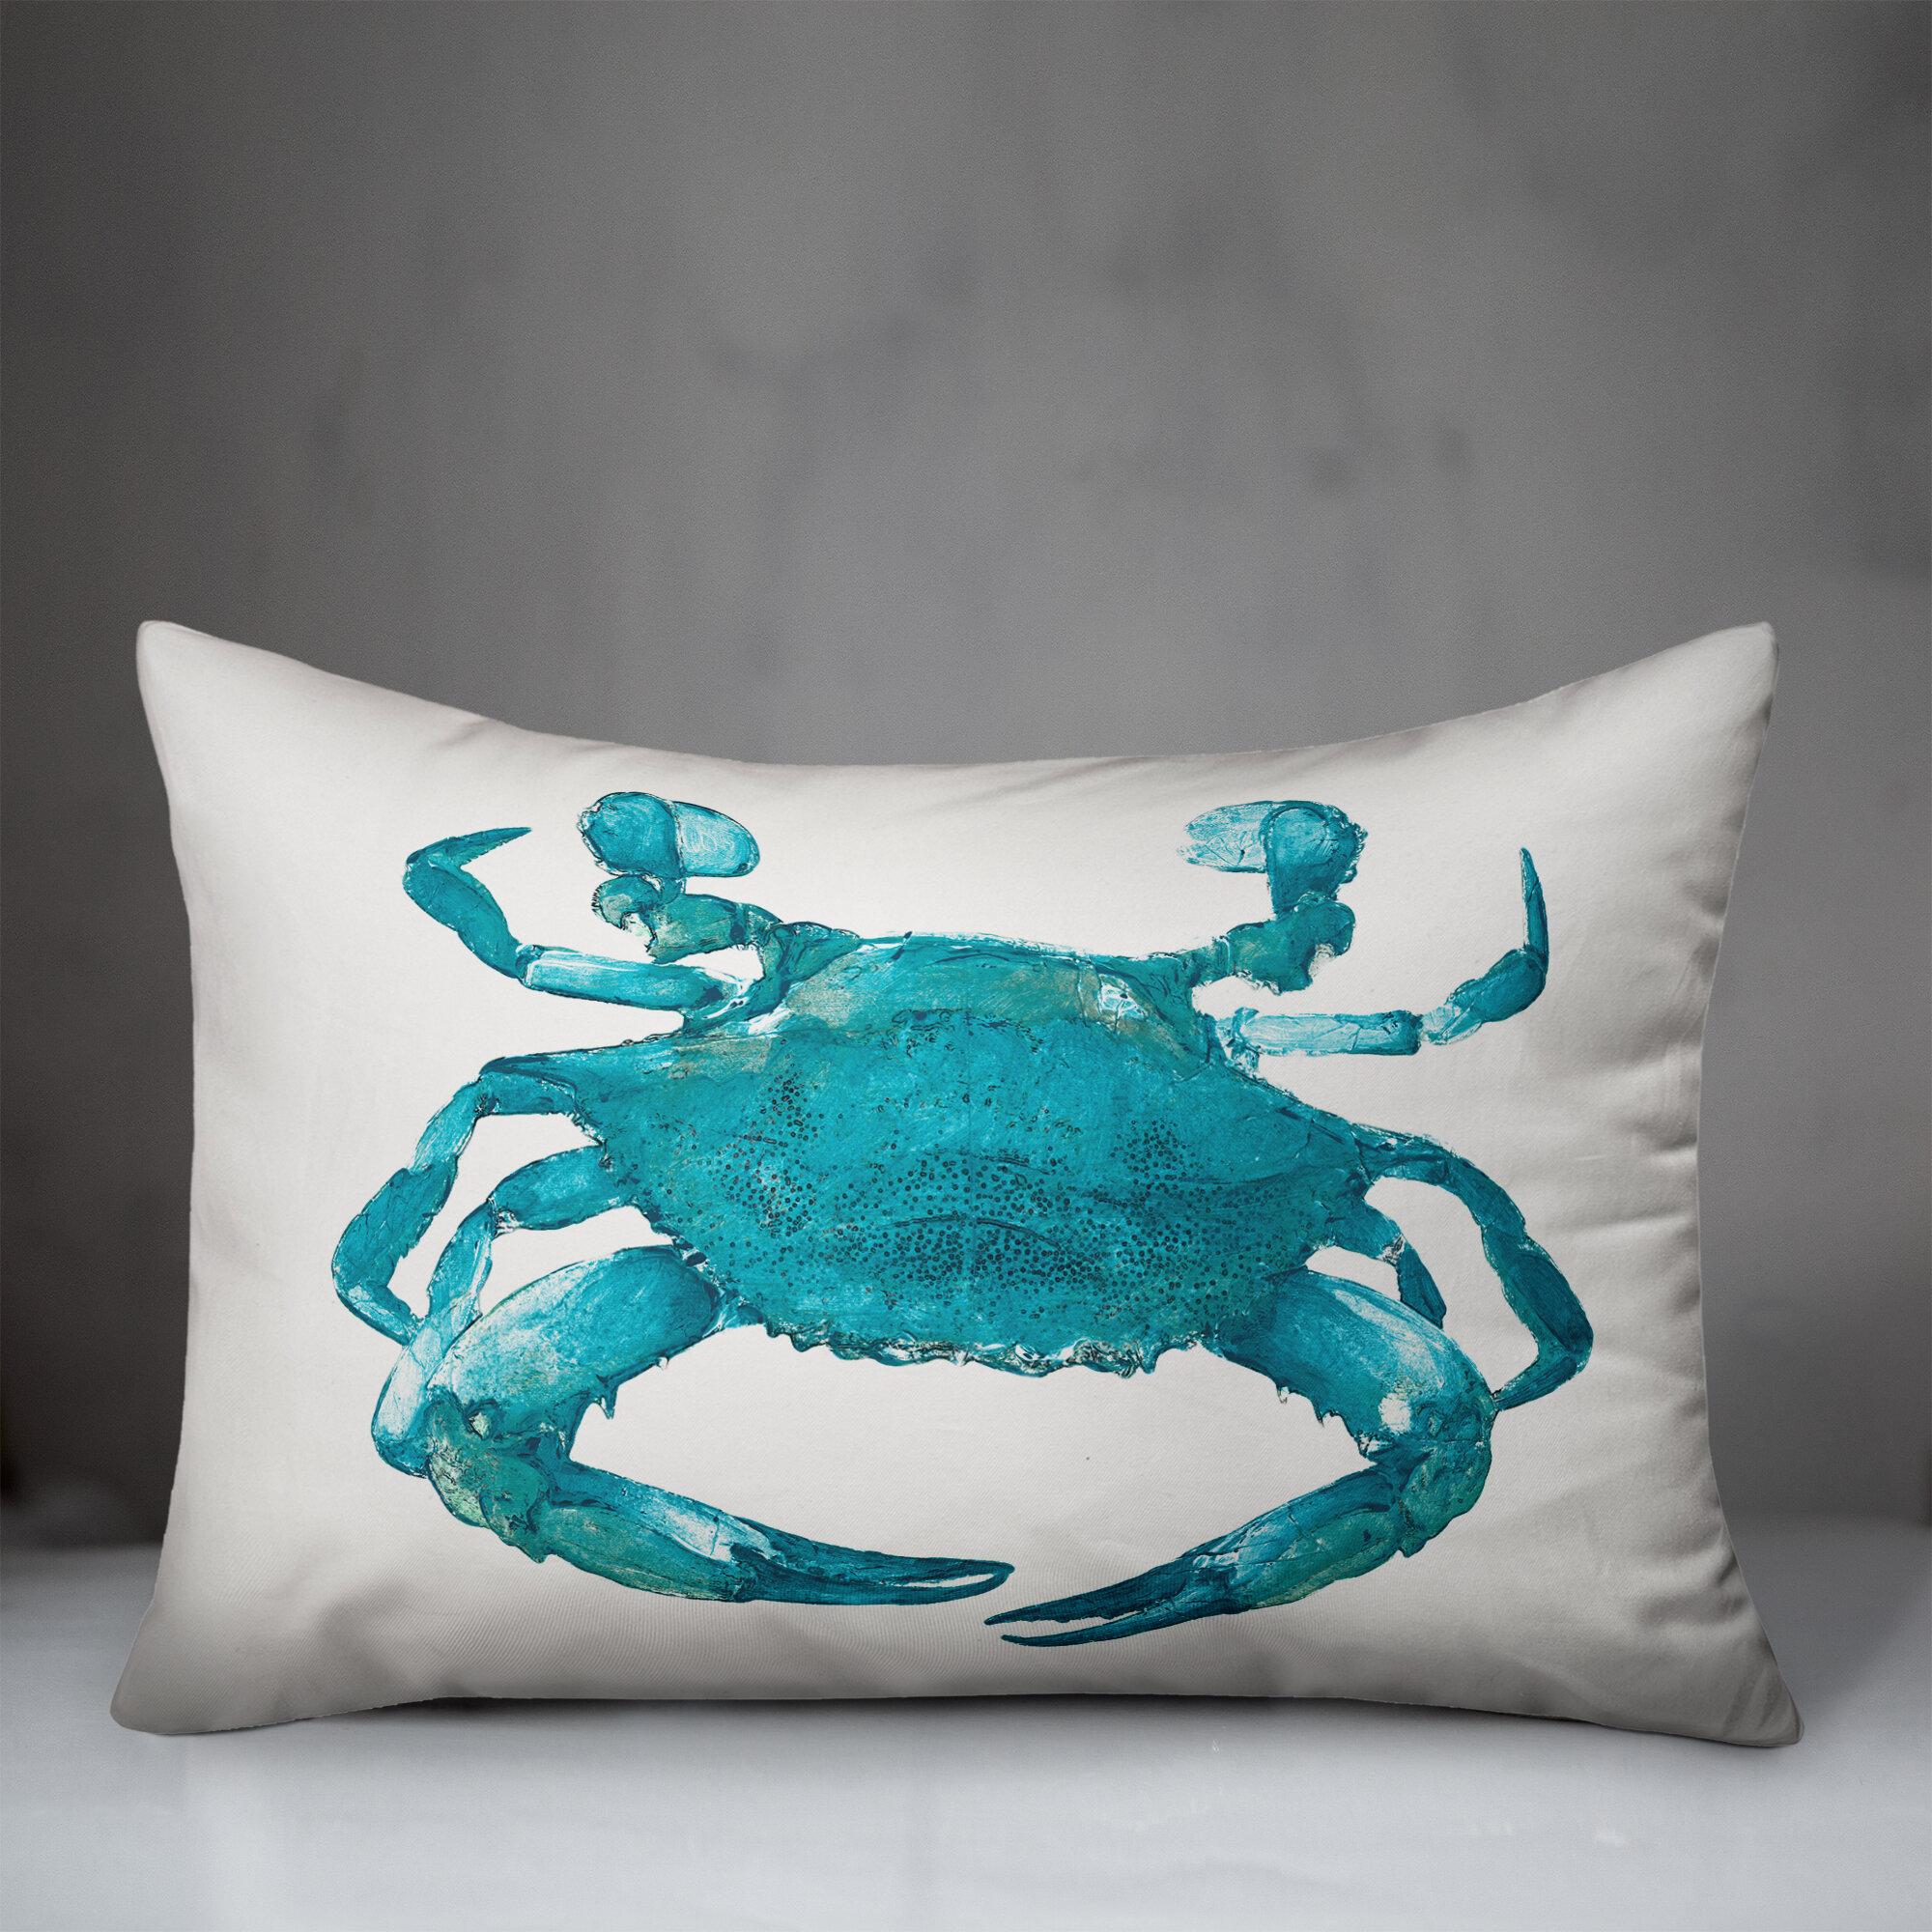 Designs Direct Creative Group Blue Painterly Crab Throw Pillow Wayfair